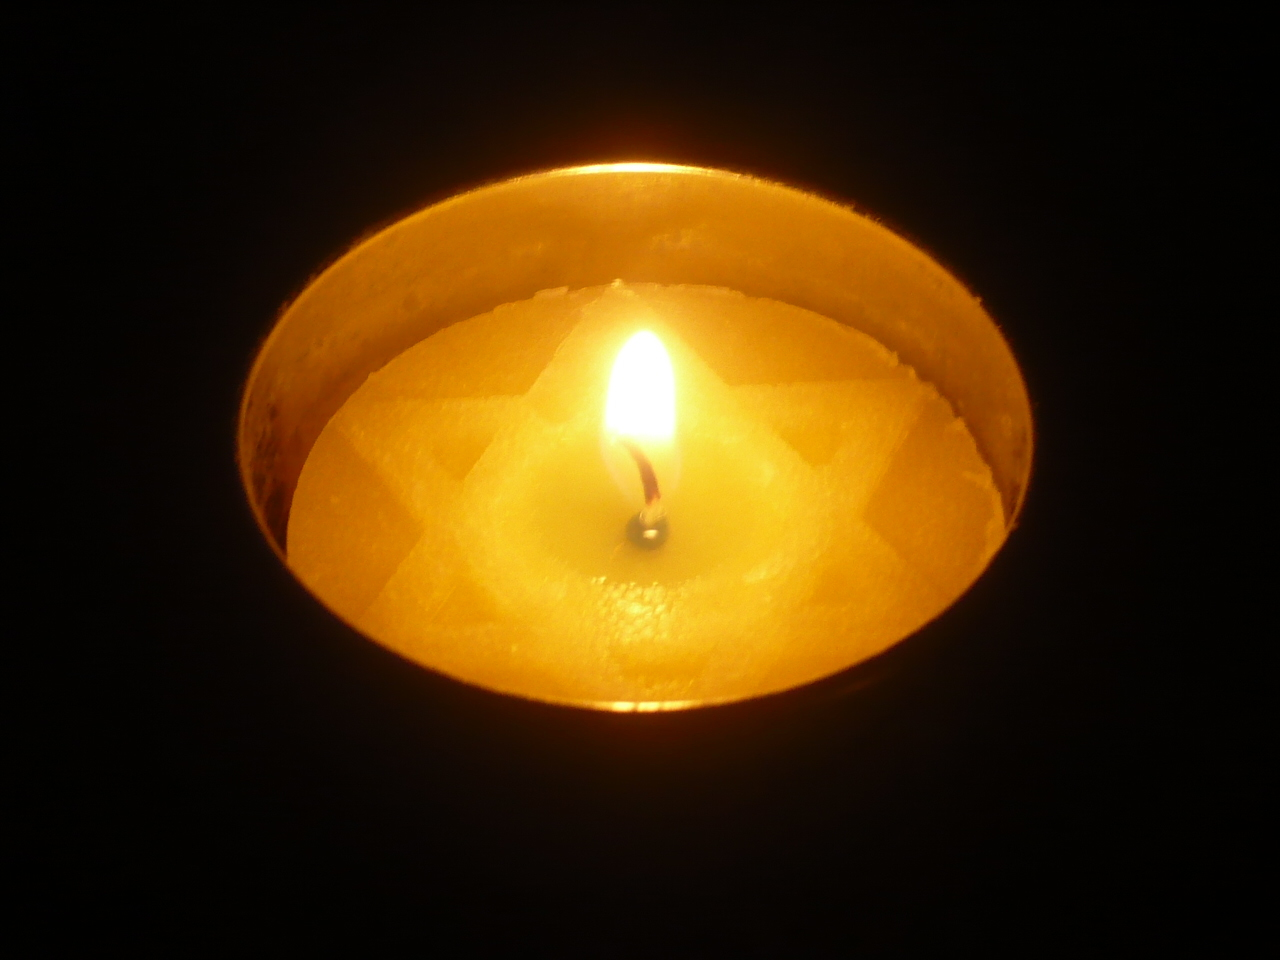 Yom_Hashoah_candle.jpg